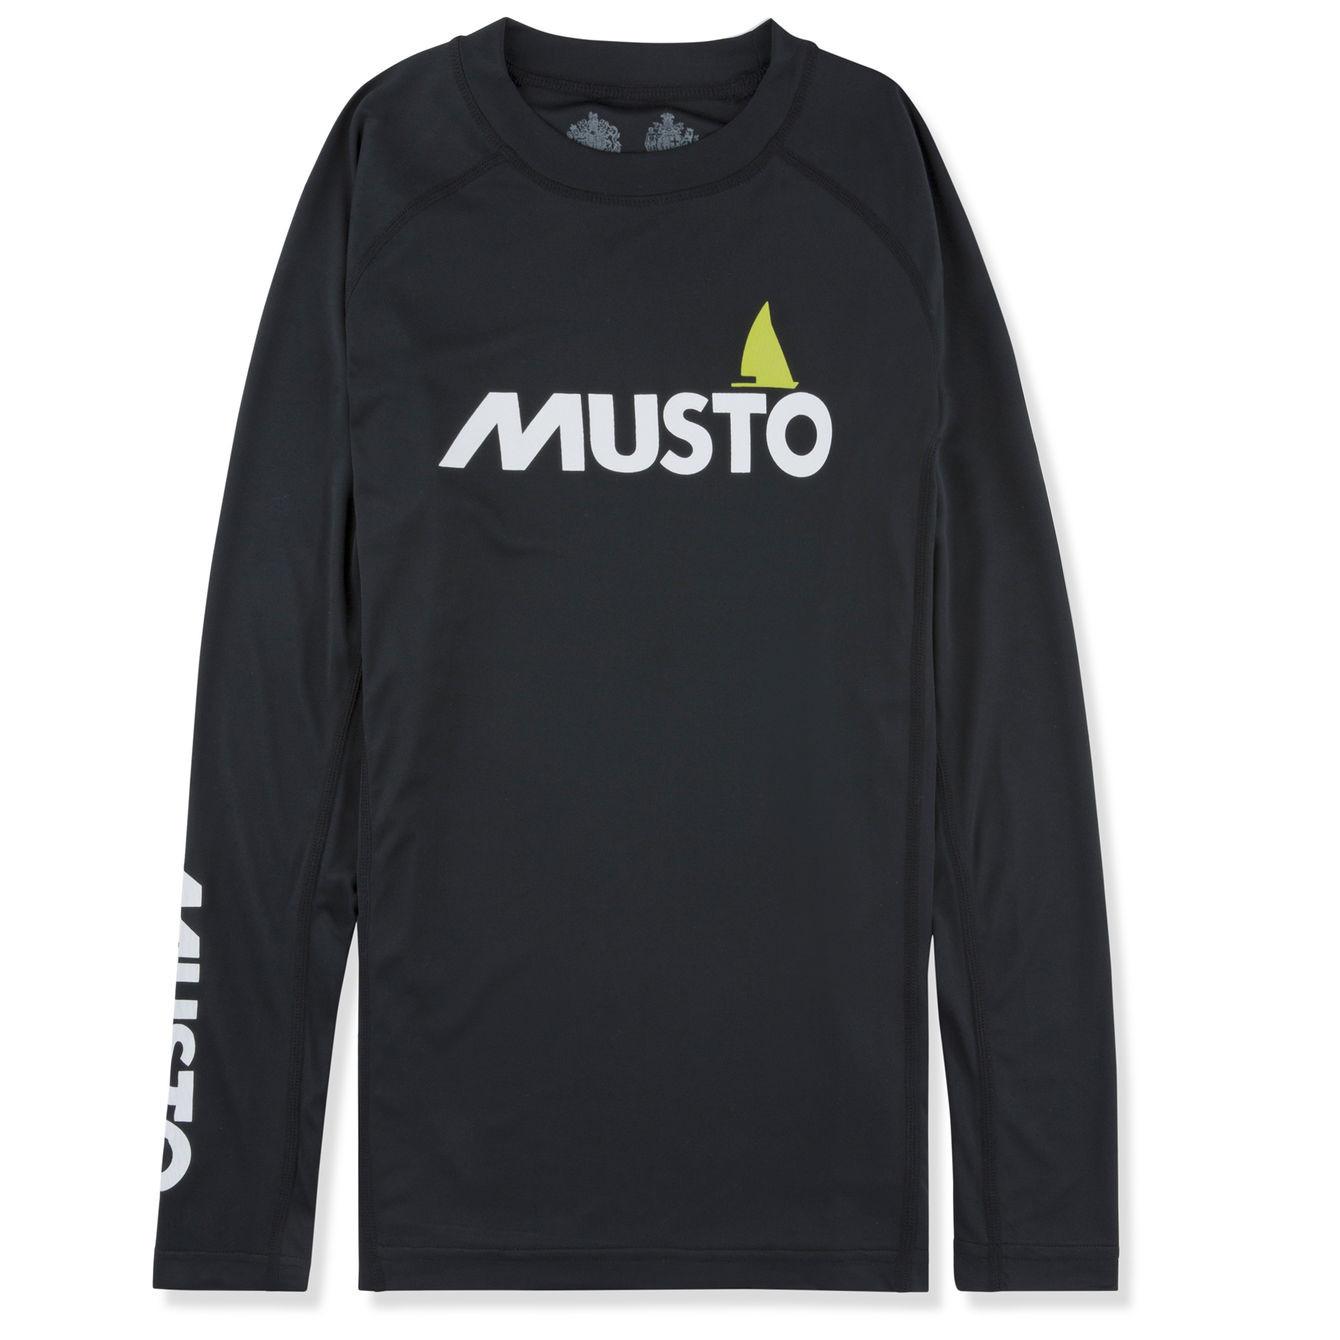 Musto Insignia UV FD RASH GD - Youth